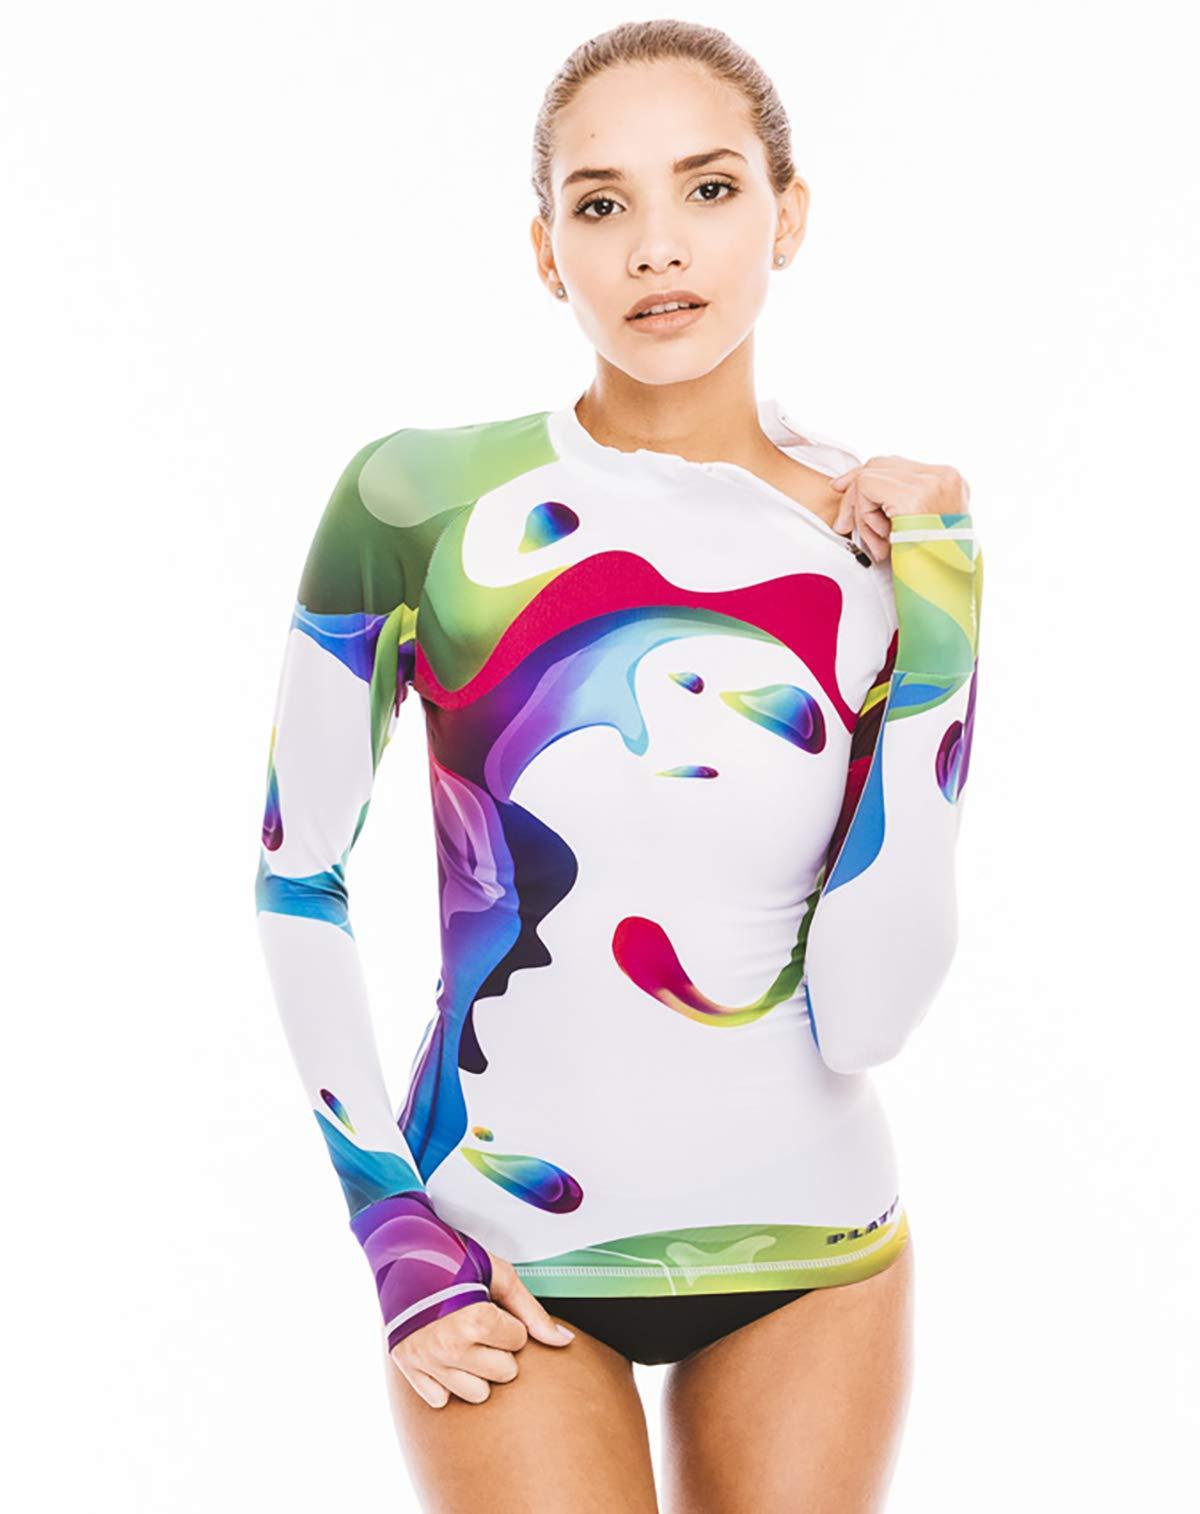 Women's Rash Guard Swim Shirt Long Sleeve Swimsuit Top Bathing Swimming Shirts - Sun Protection Clothing UPF 30+ (Rainbow Neck Zipper, XL) by Platinum Sun